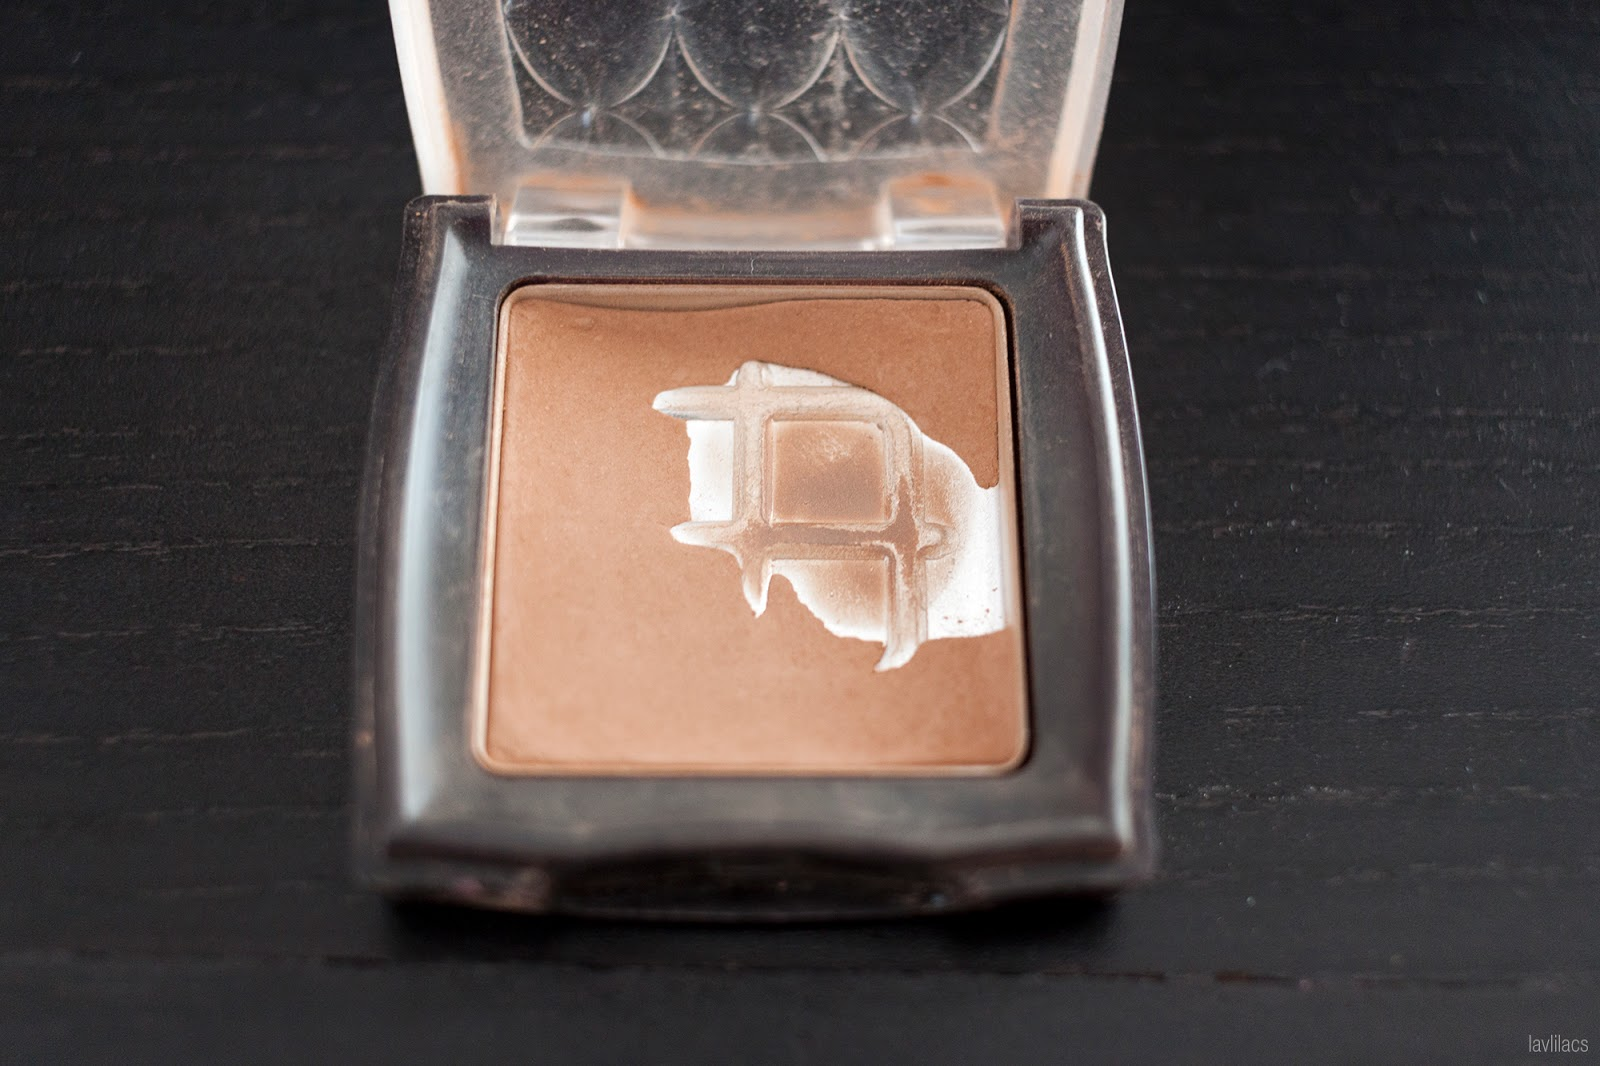 Etude House Model Face Color contour, Korean cosmetics, Project Make a Dent end results